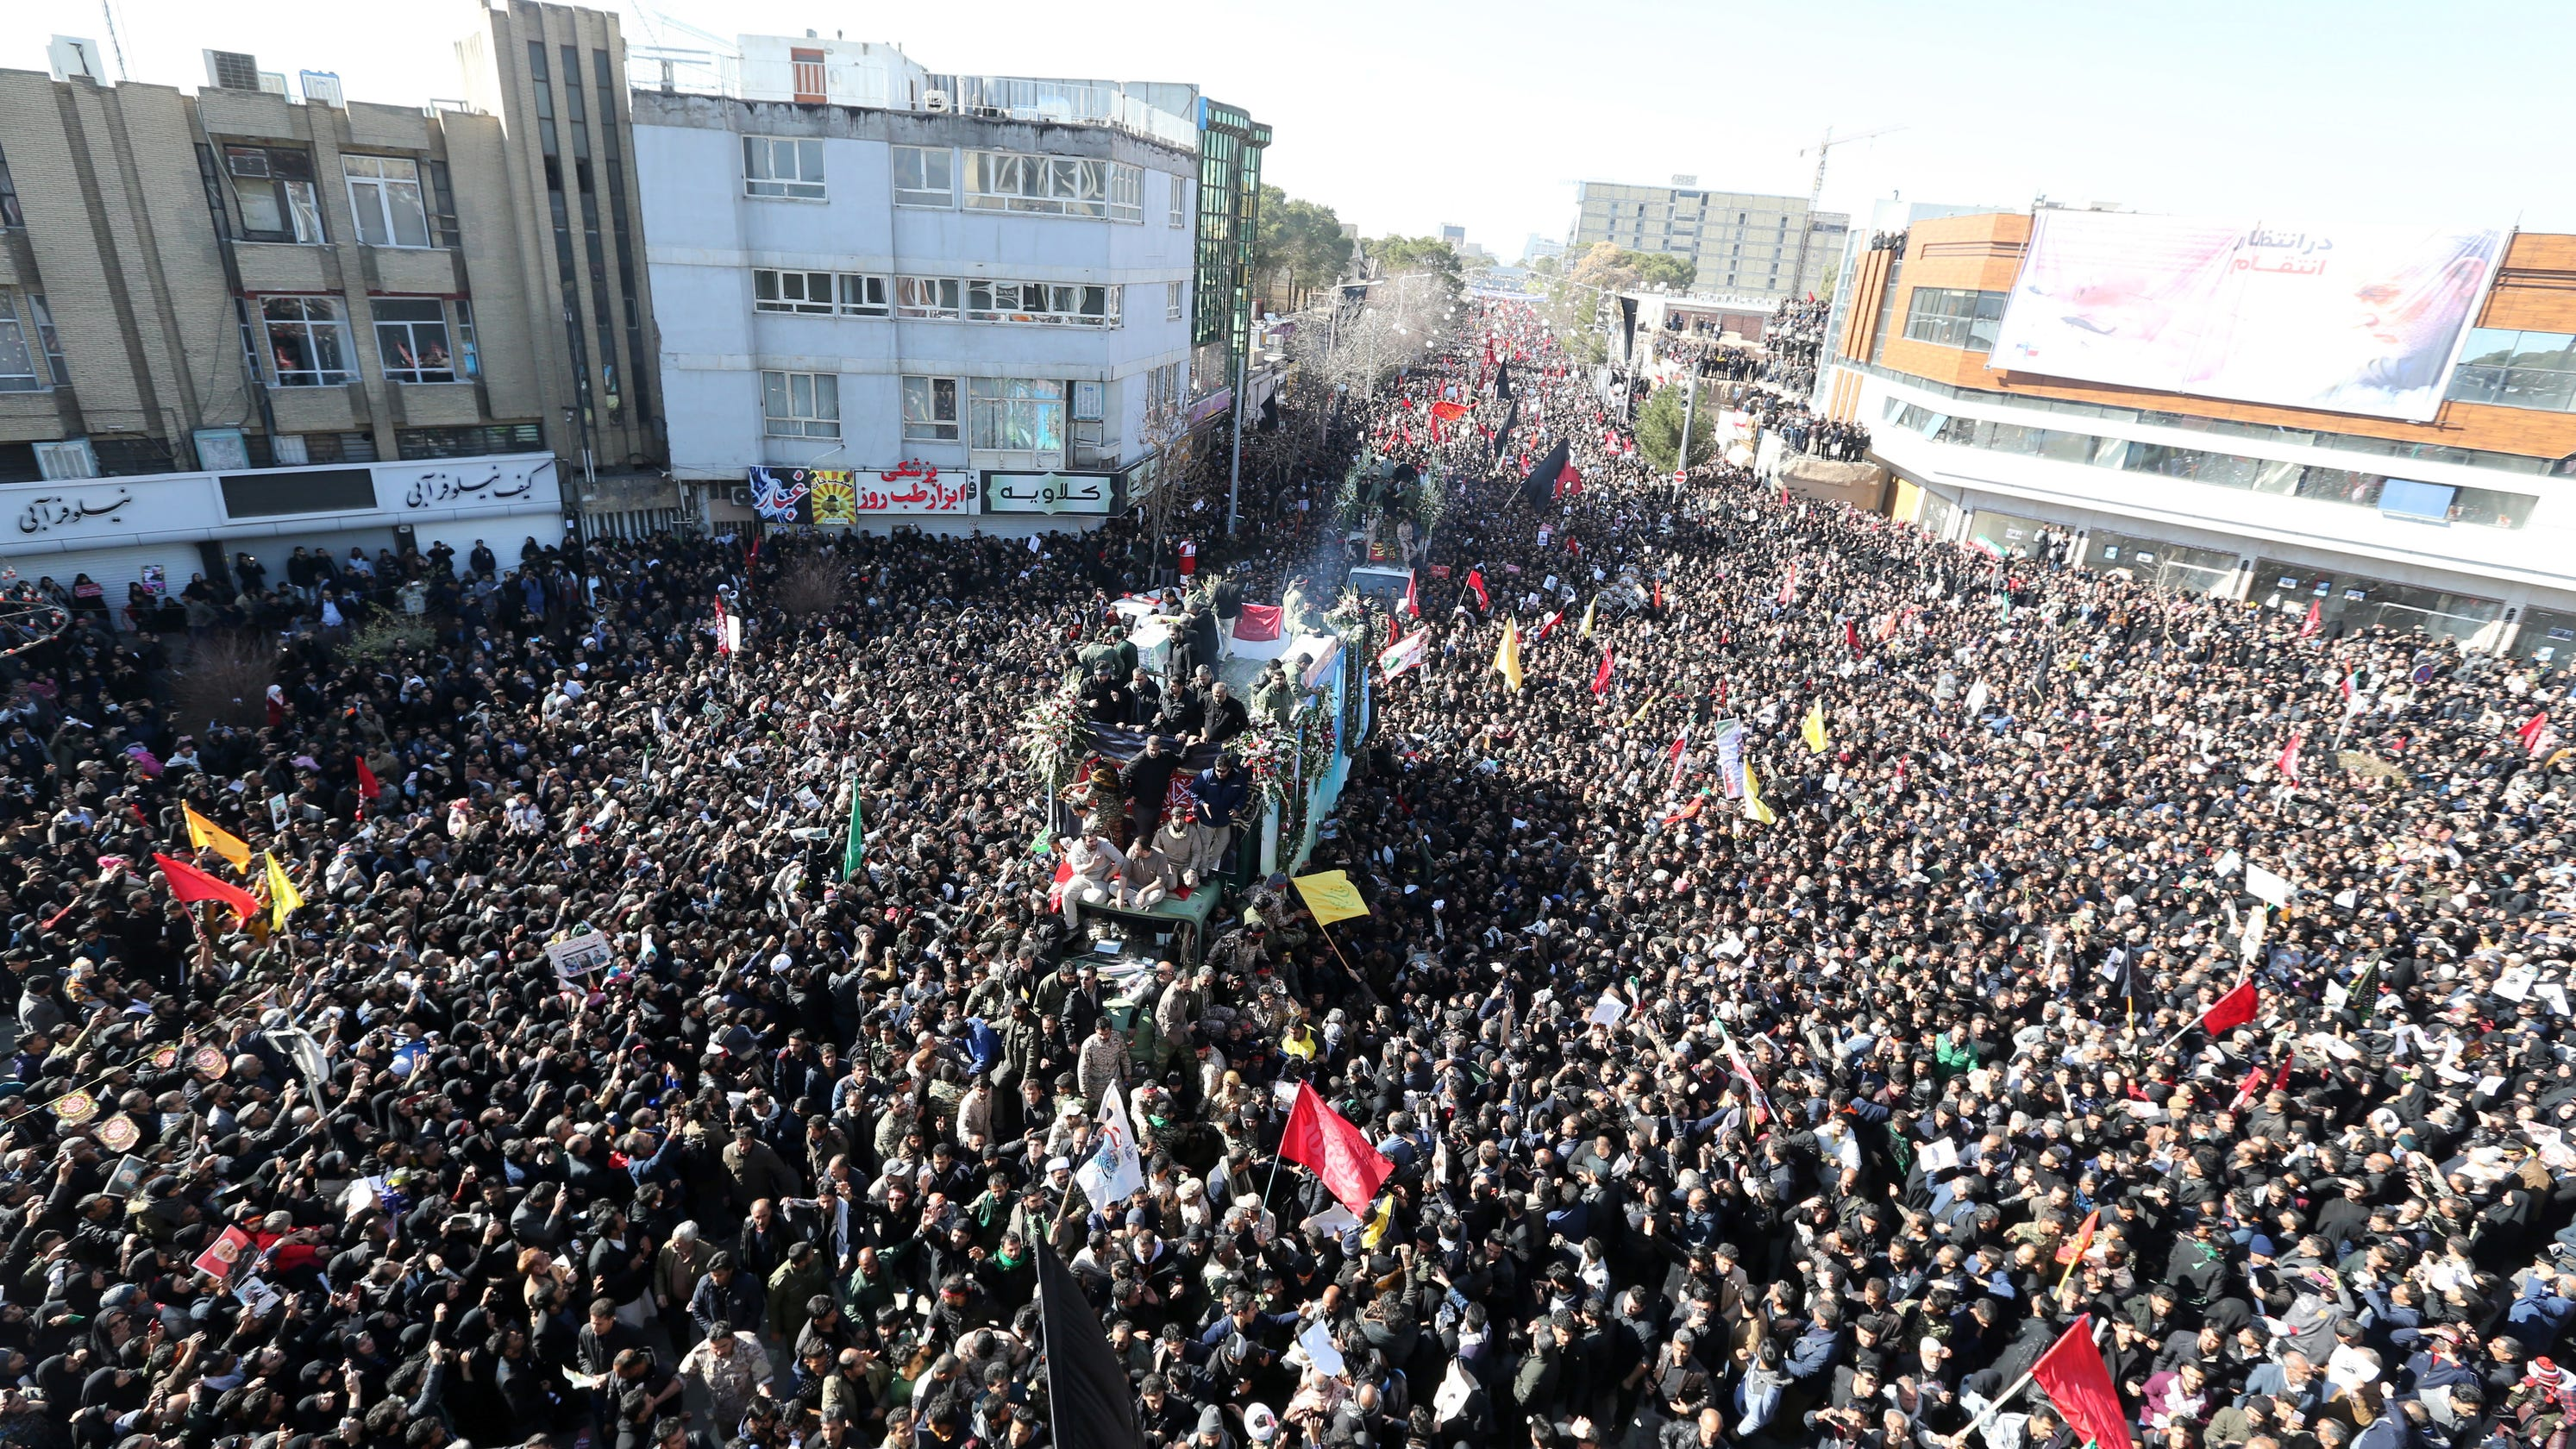 Stampede at Iranian commander Qasem Soleimani's funeral kills at least 32 thumbnail